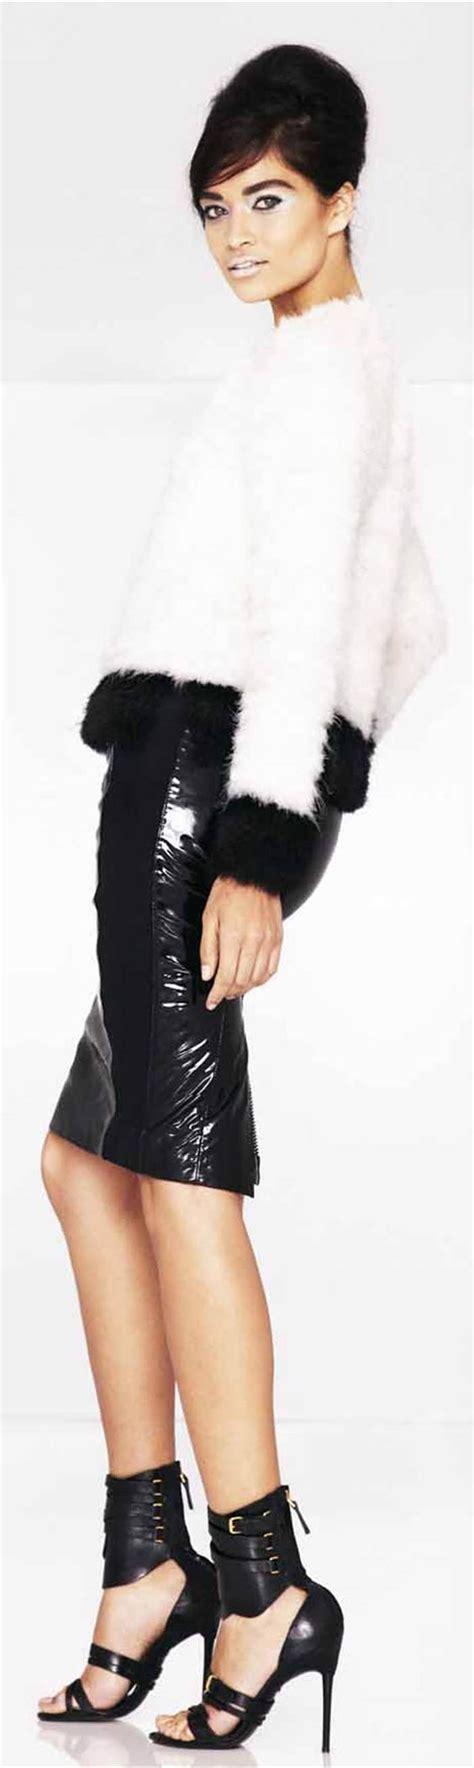 image of black pvc pencil skirt